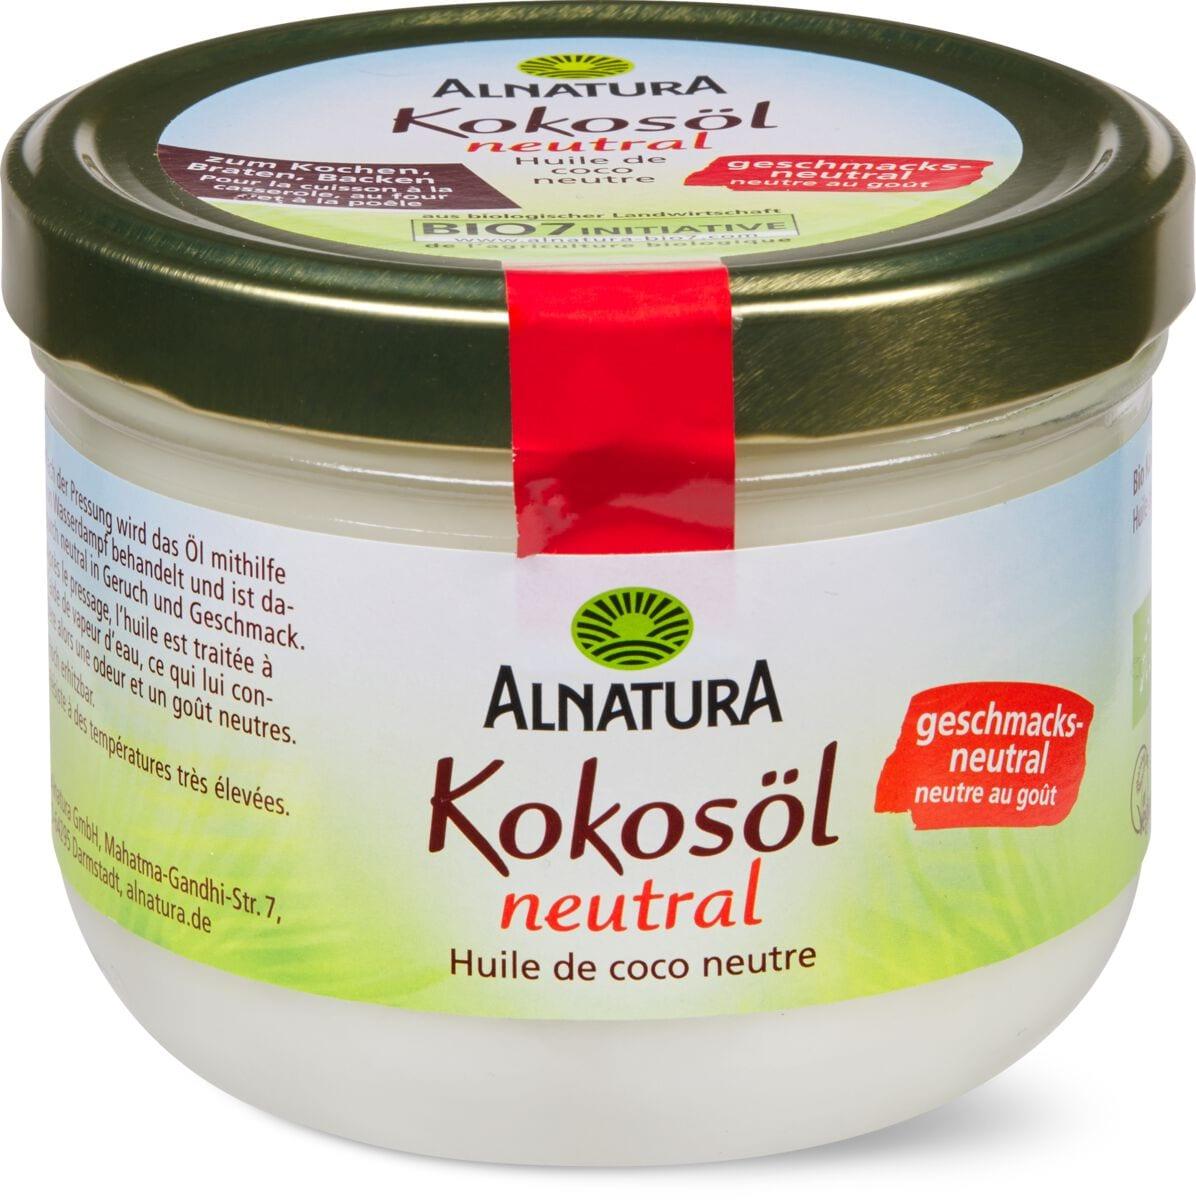 Alnatura Kokosöl neutral